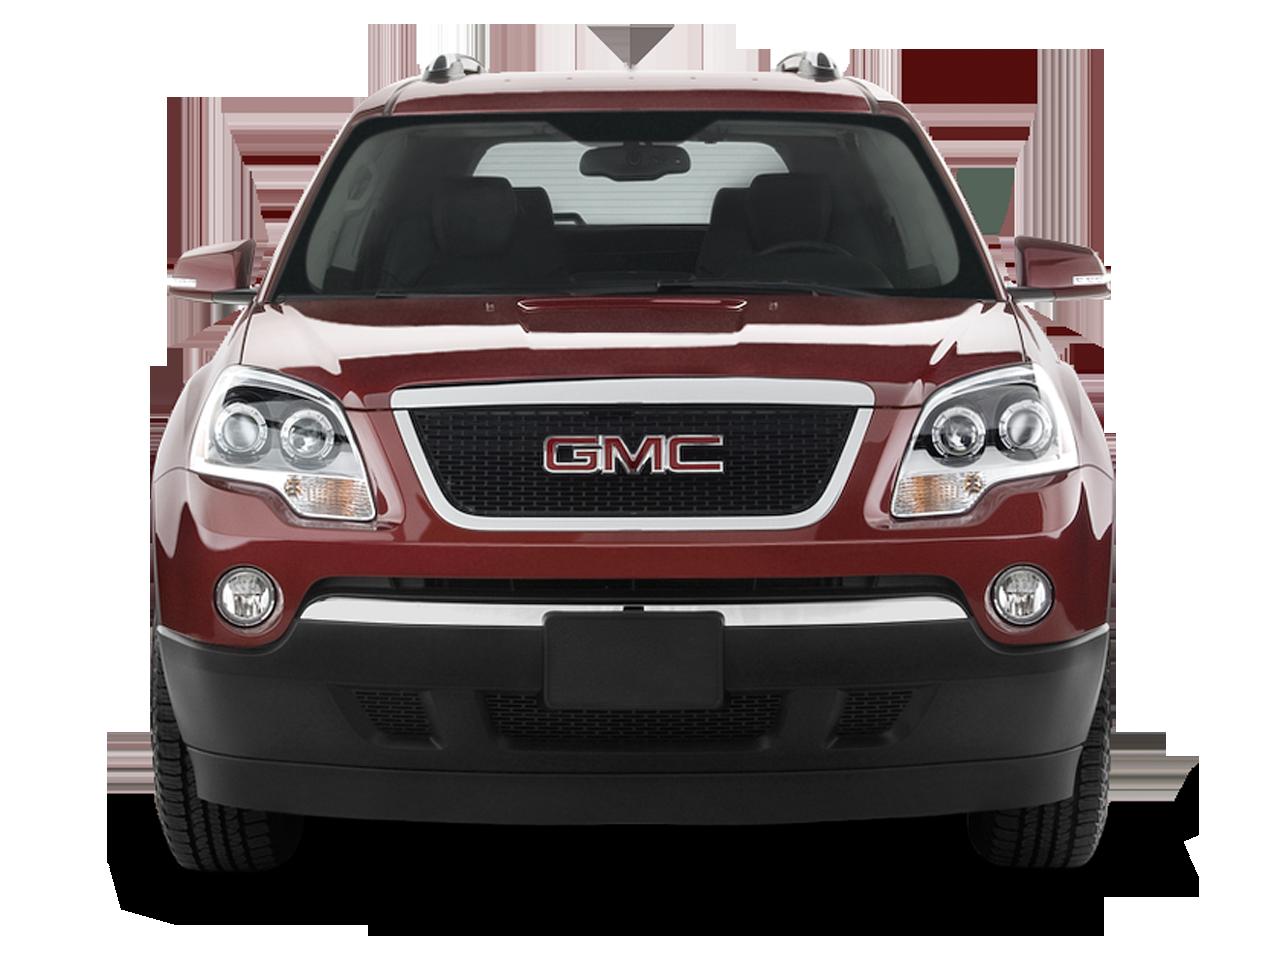 2011 gmc acadia denali 2010 detroit auto show coverage new car reviews concept cars. Black Bedroom Furniture Sets. Home Design Ideas